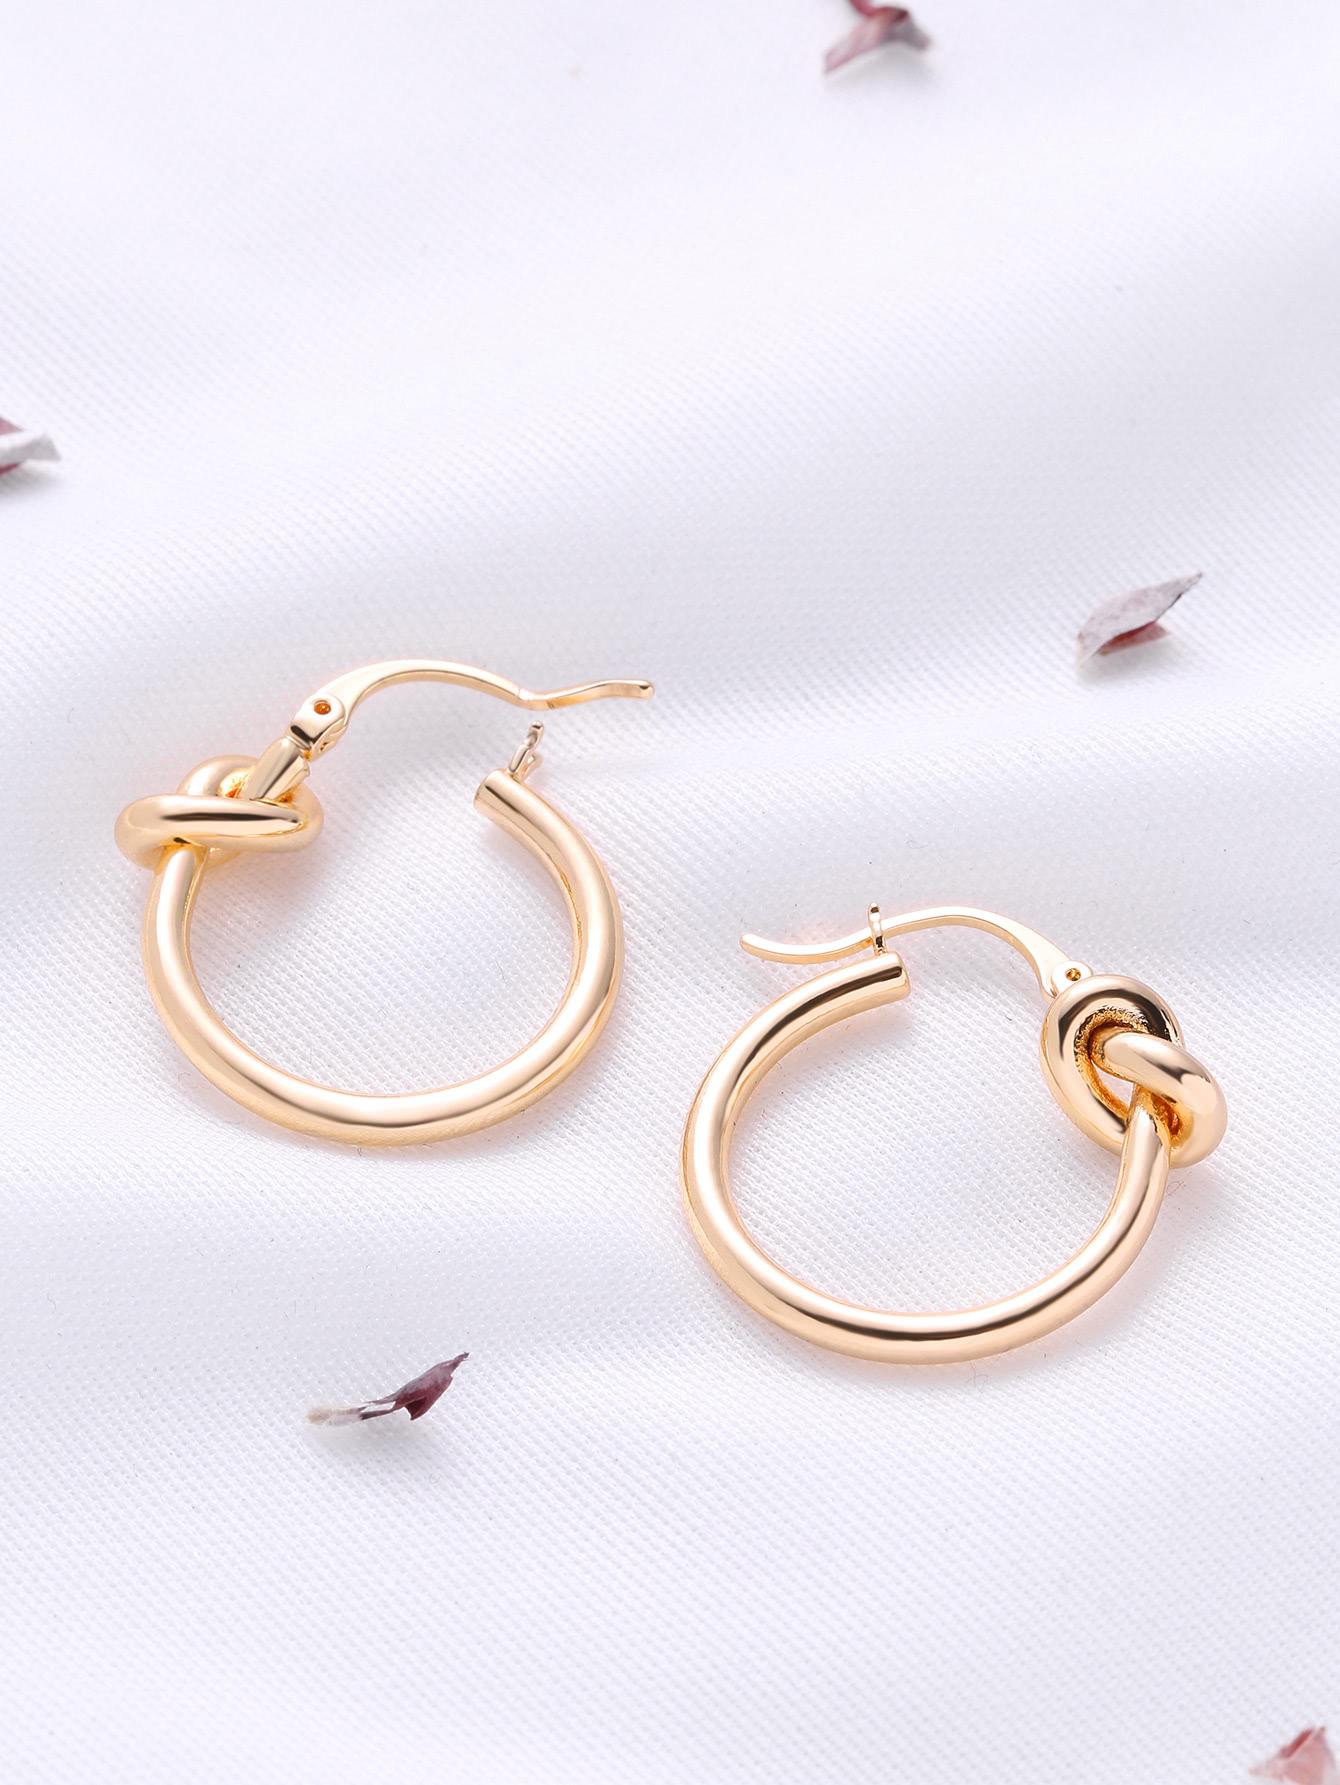 цены Knot Design Hoop Earrings